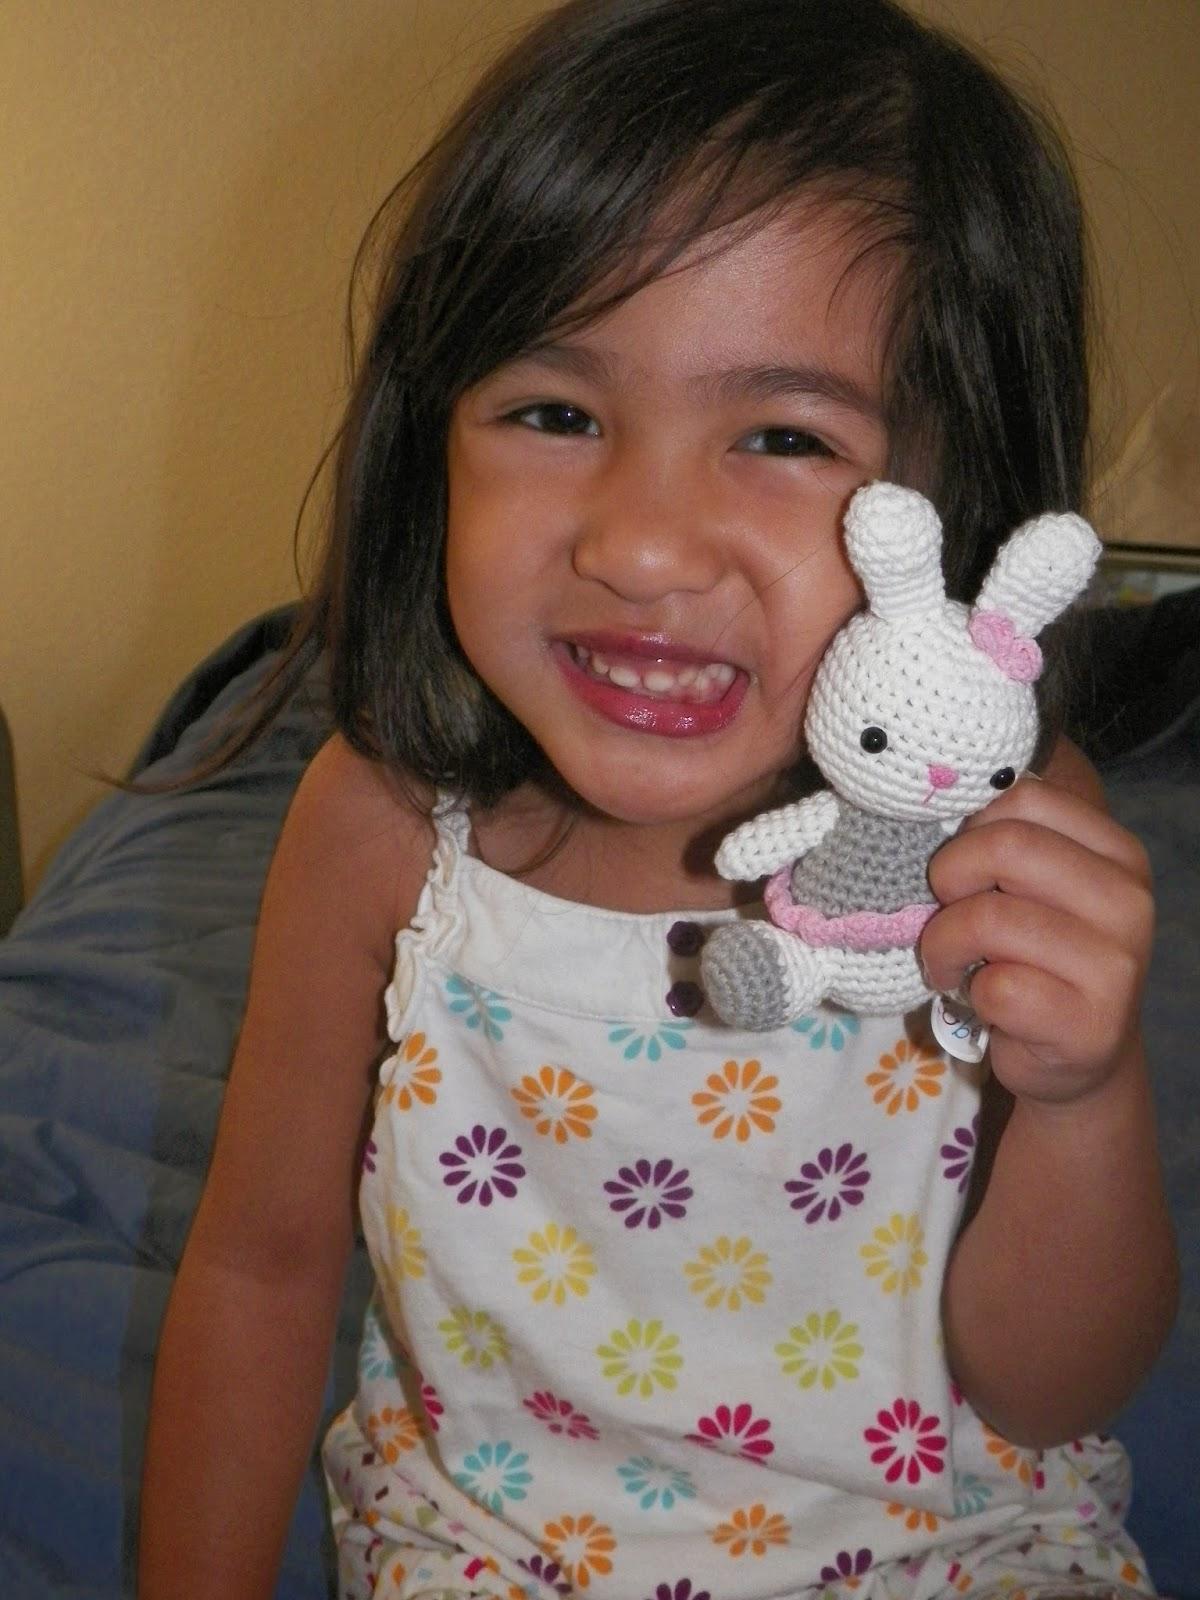 Zubels_Lil_Dimples_Hand_Crochet_Dolls.jpg